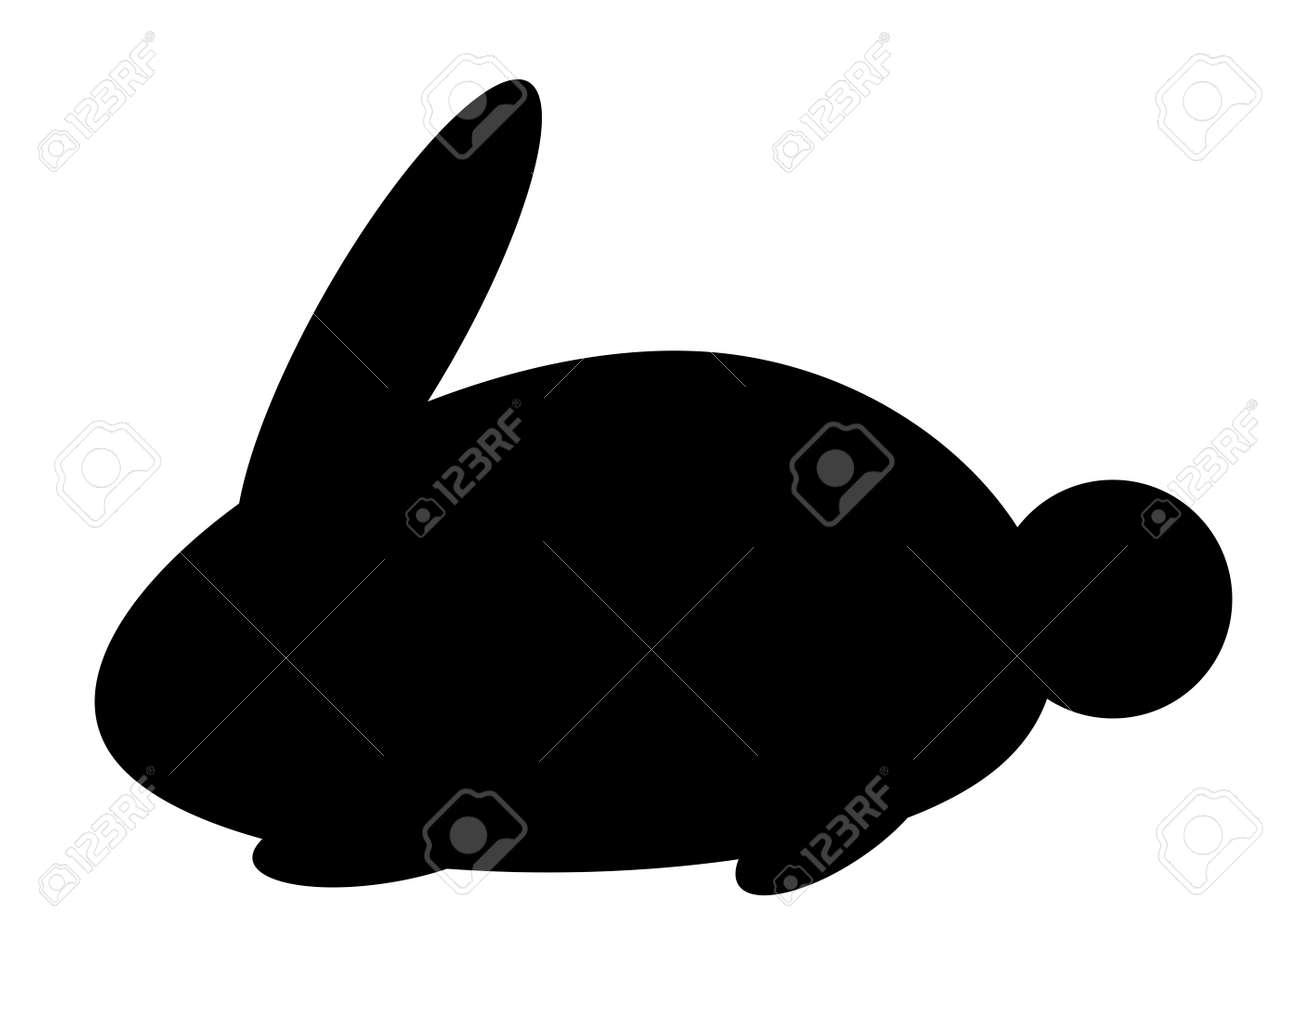 Rabbit silhouette - 156589710